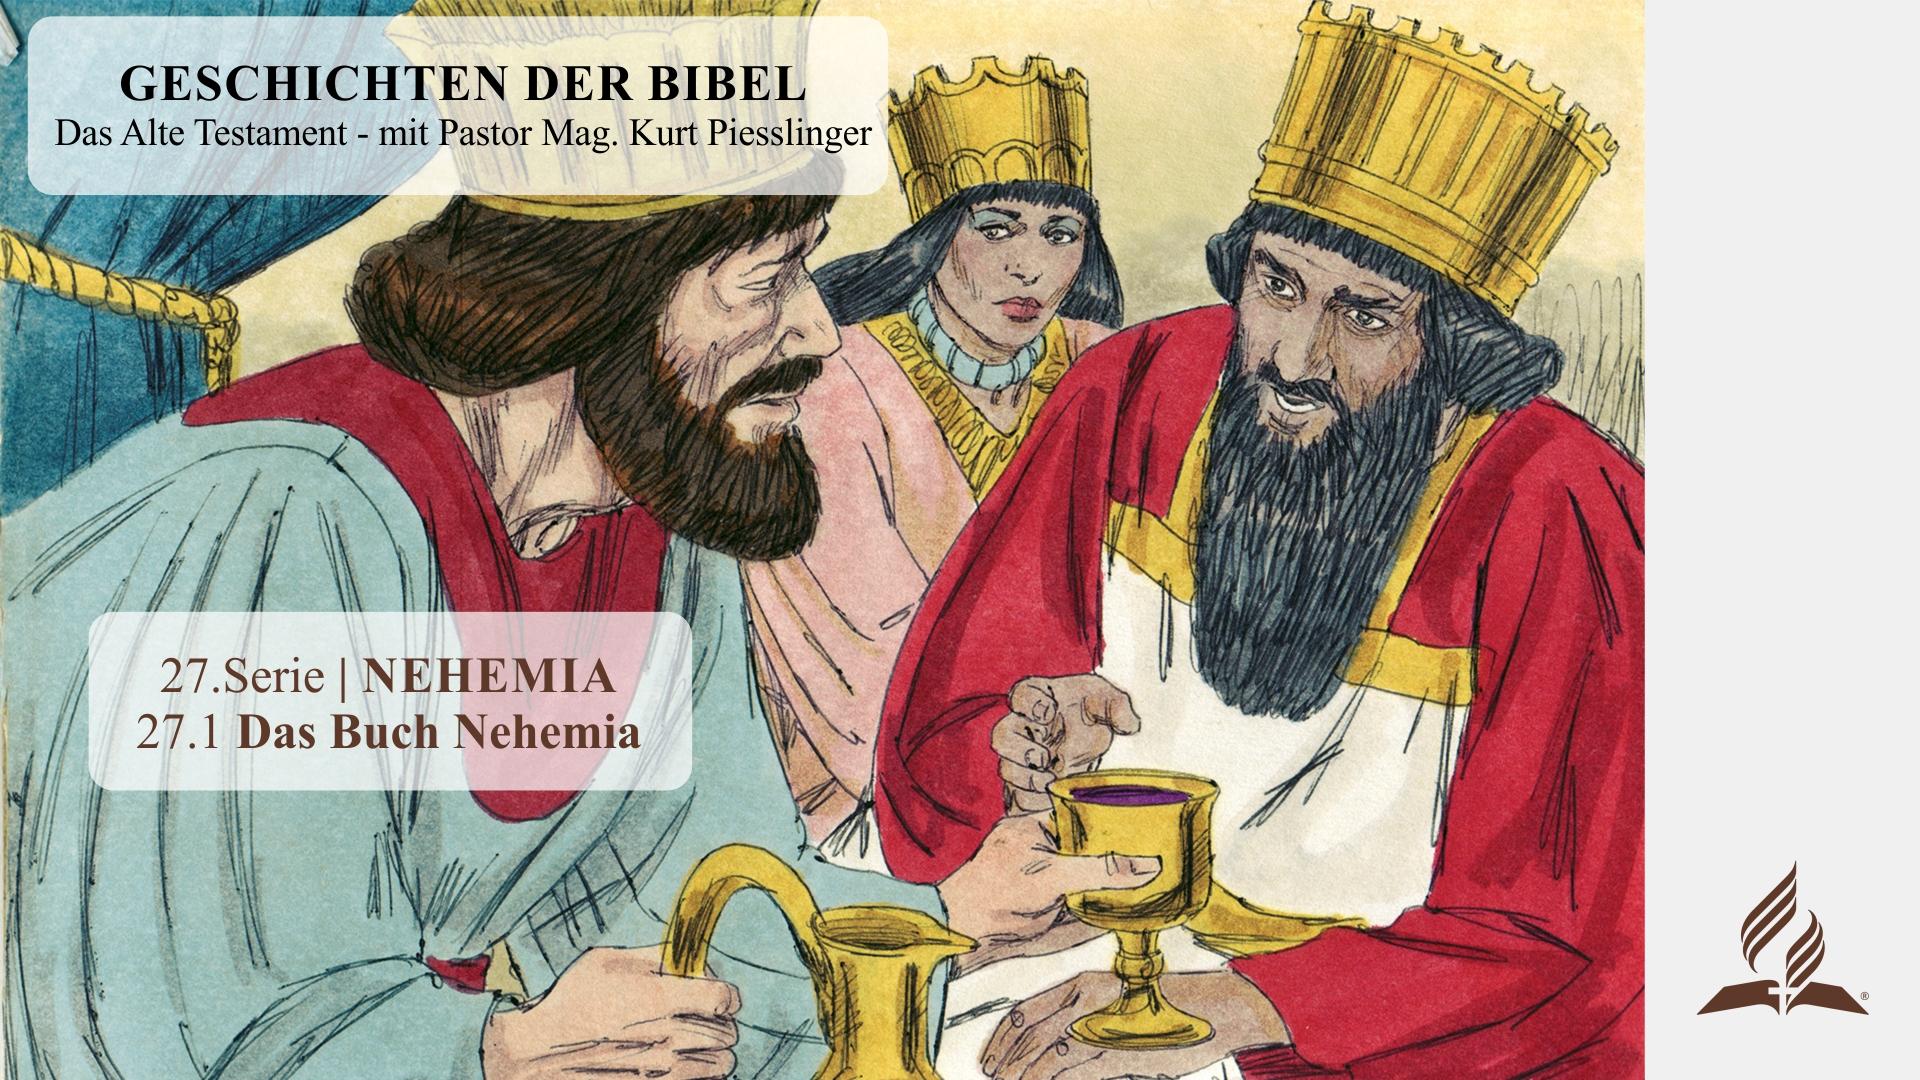 GESCHICHTEN DER BIBEL: 27.1 Das Buch Nehemia – 27.NEHEMIA | Pastor Mag. Kurt Piesslinger